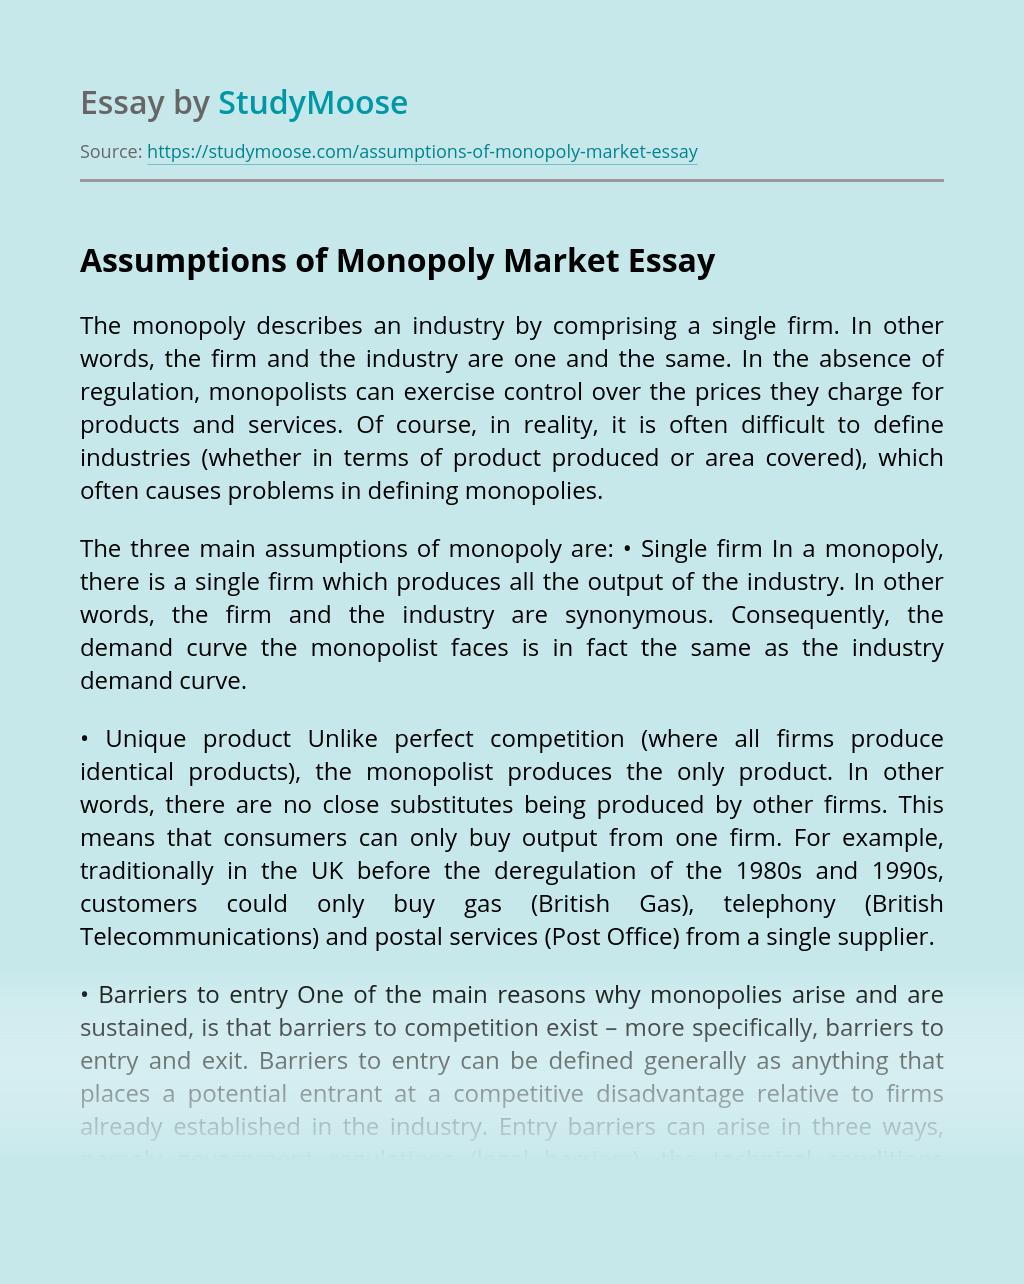 Assumptions of Monopoly Market